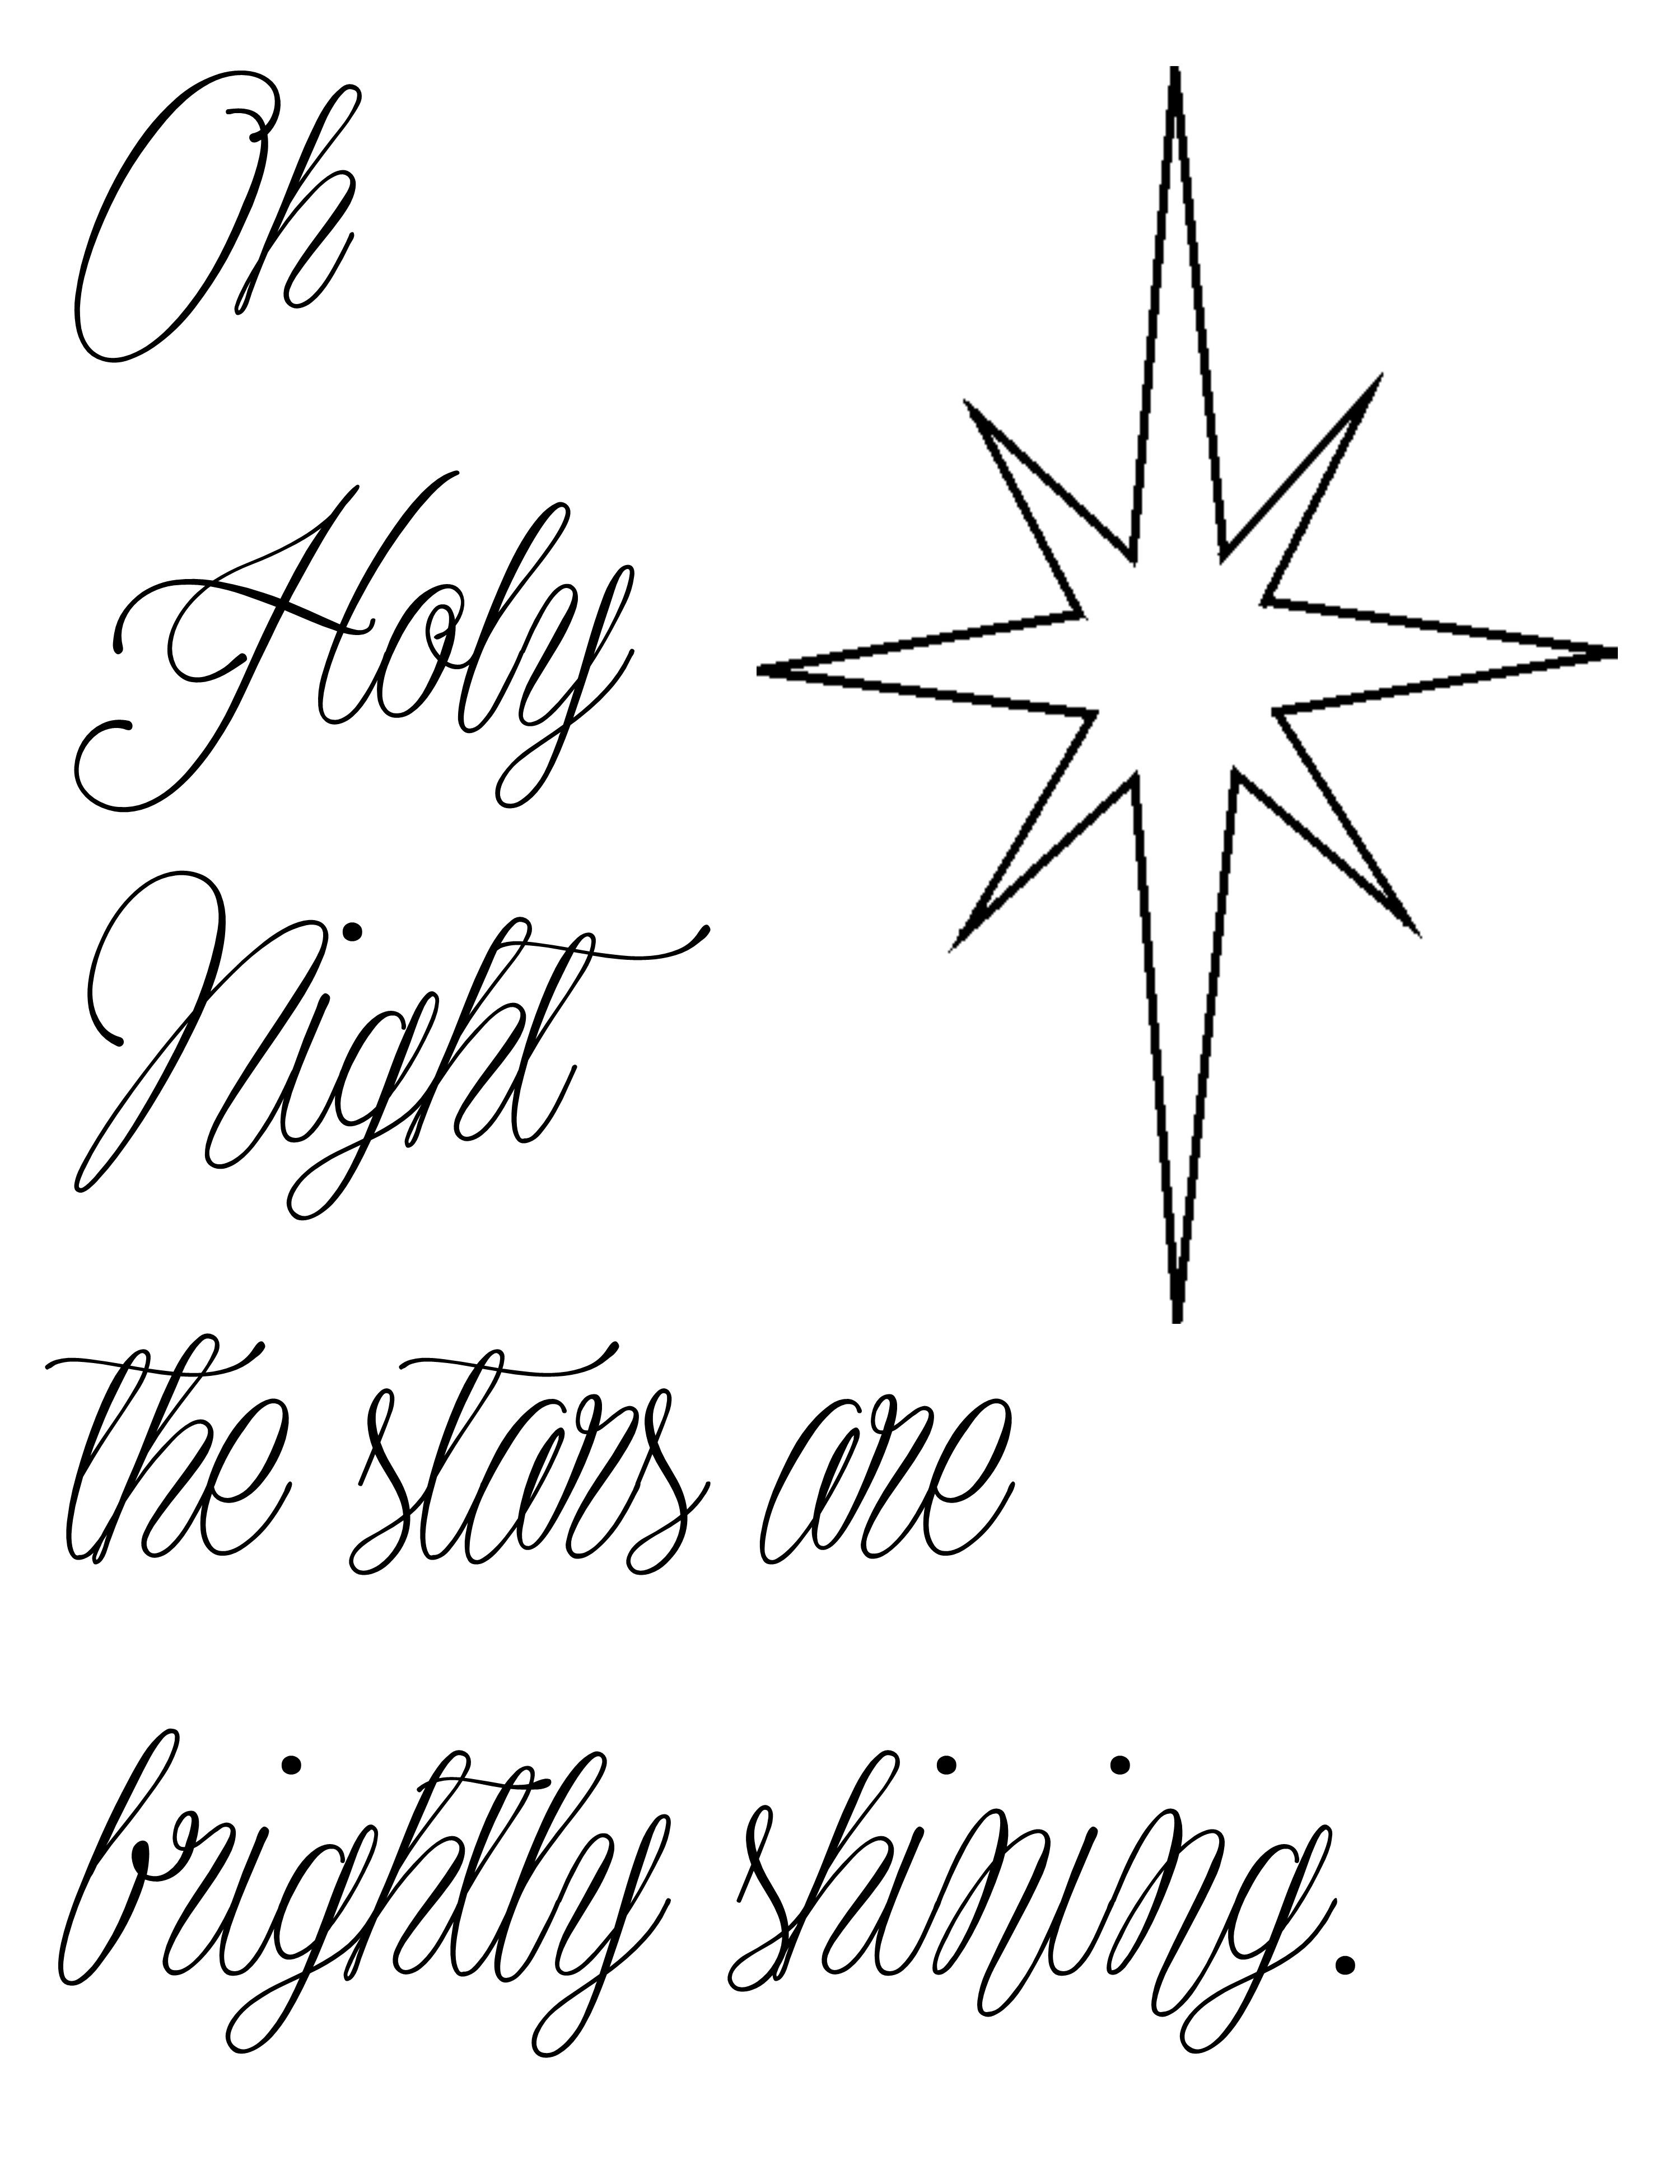 Free Christmas printable template- use it to make your own